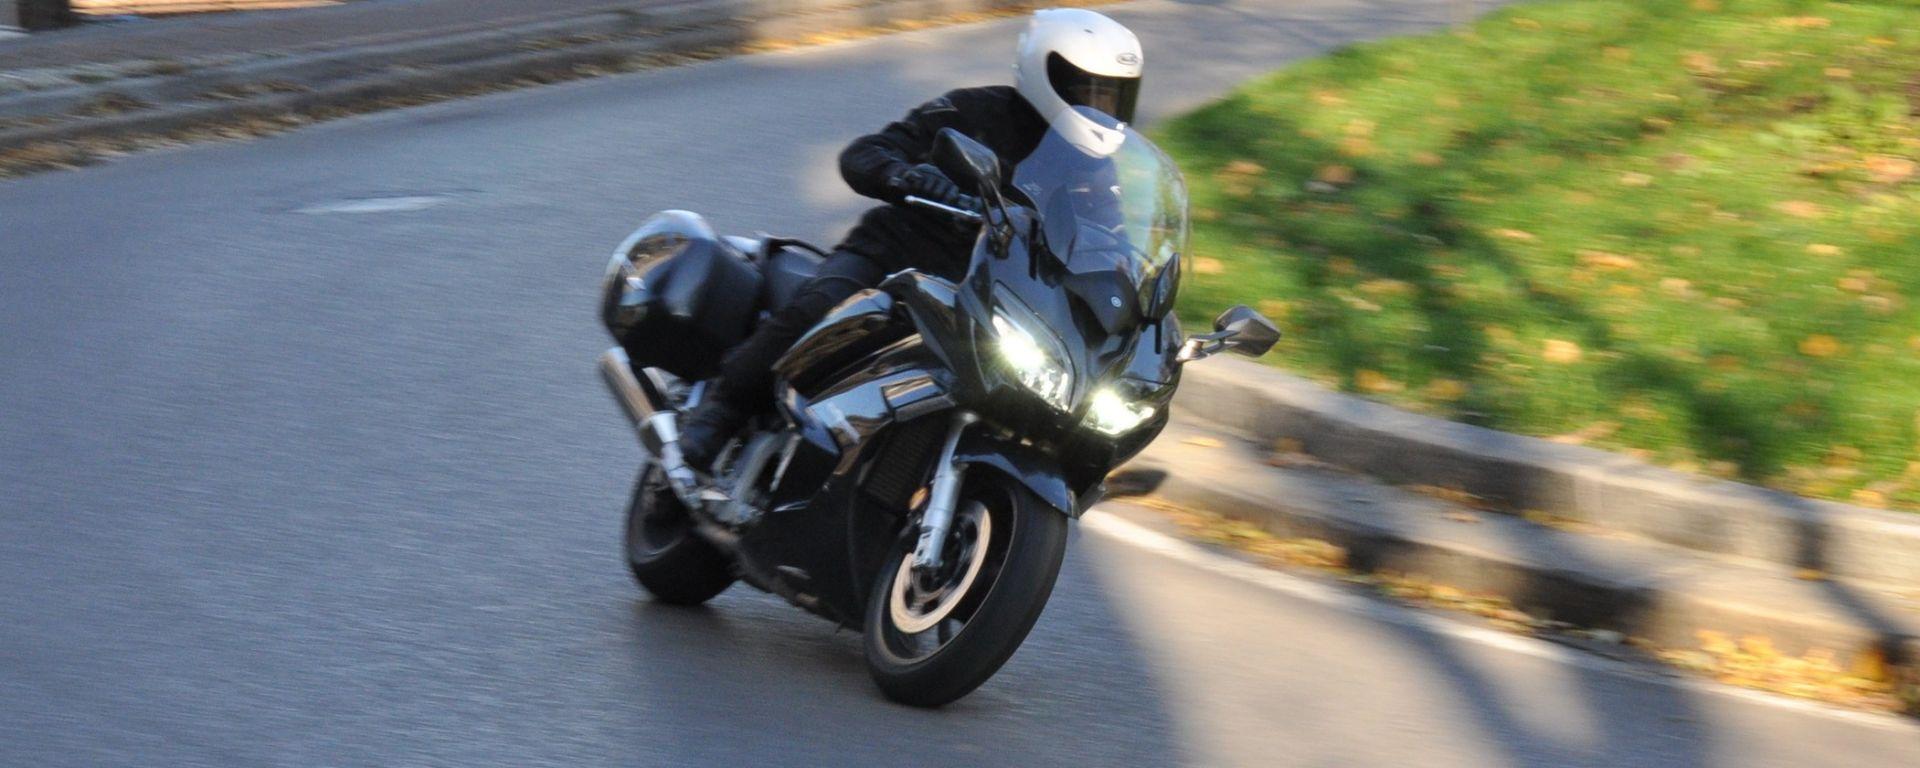 Yamaha FJR1300A 2016, la prova